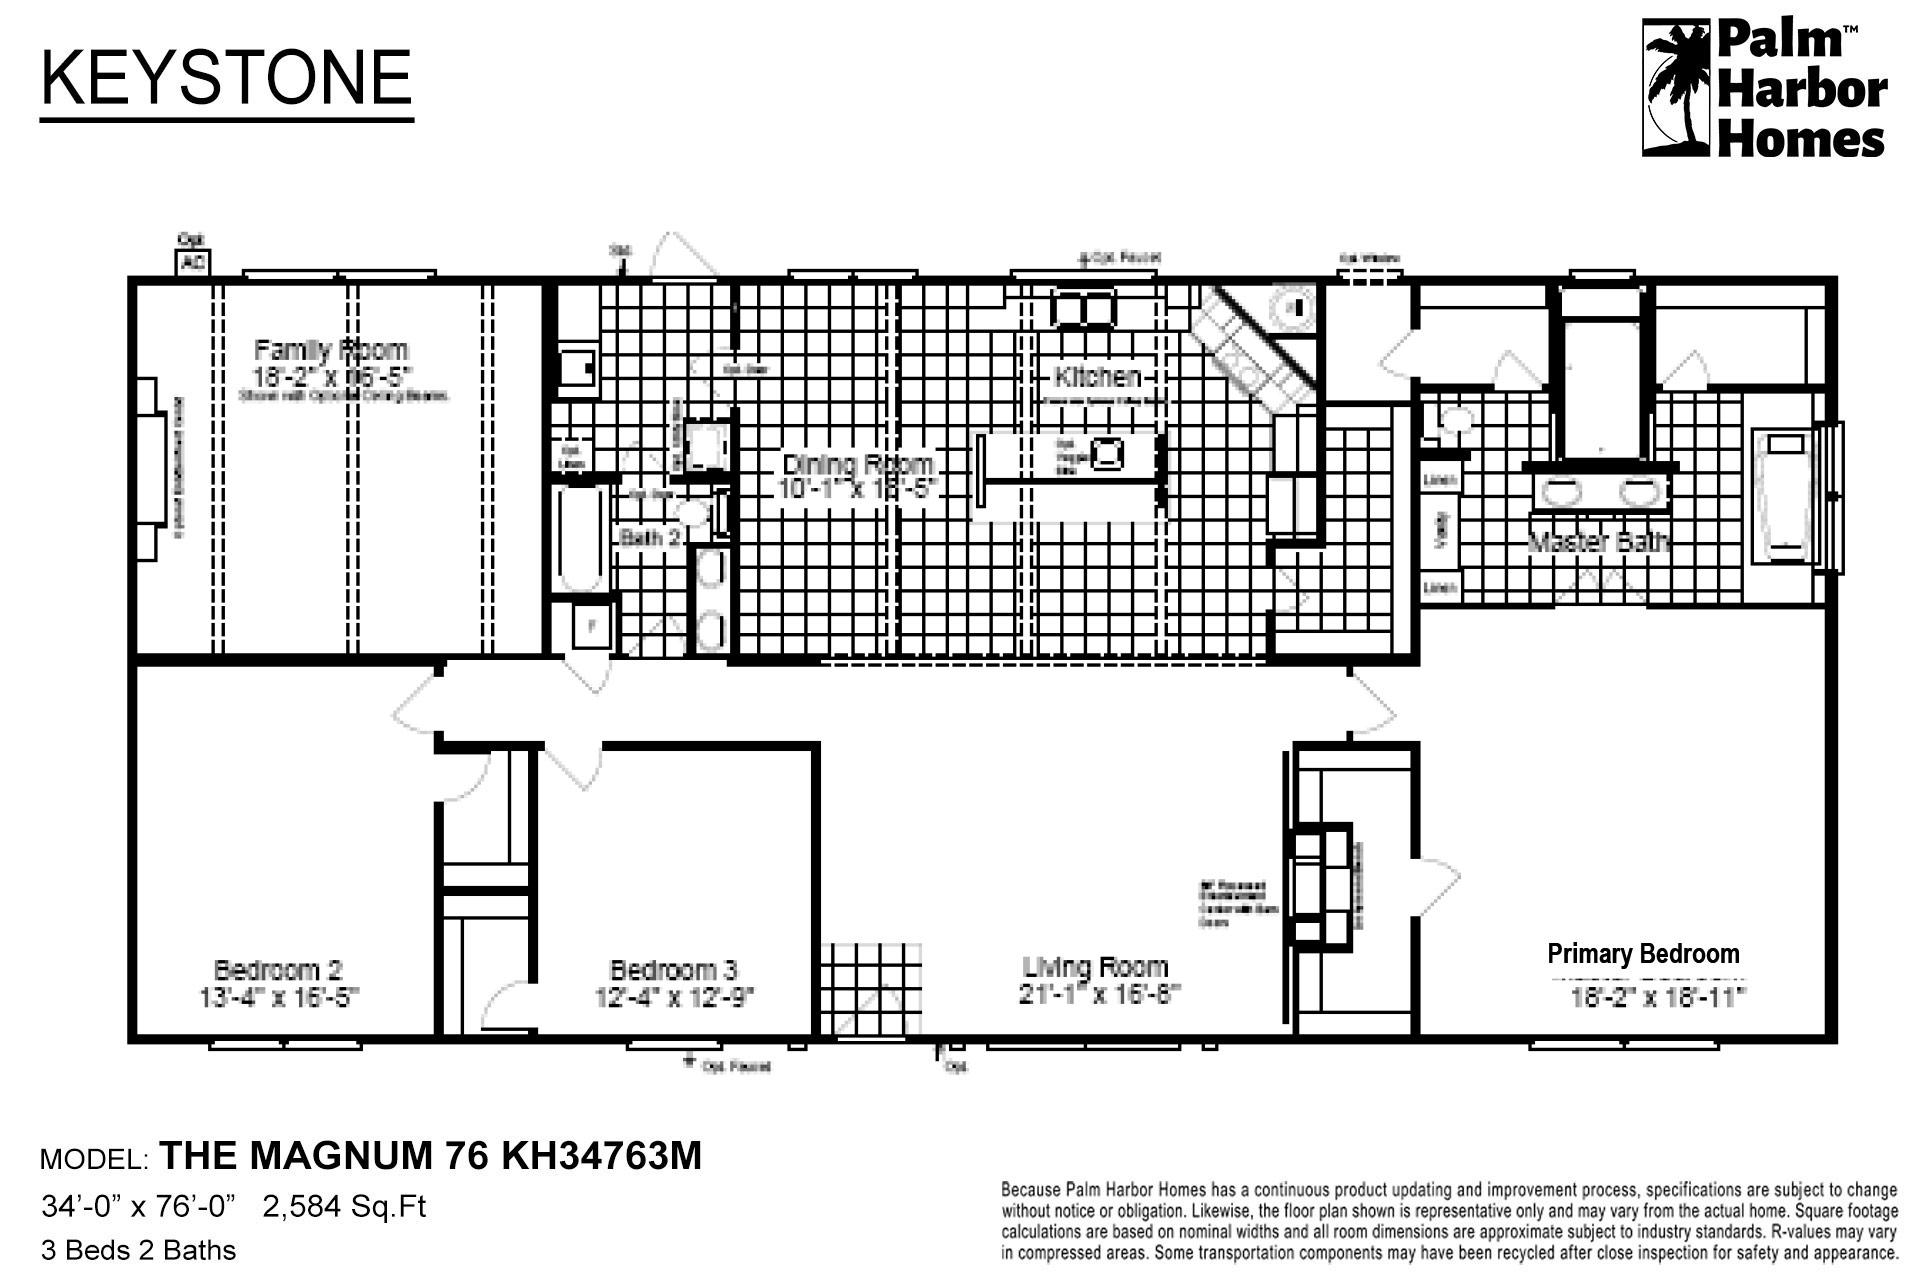 Keystone The Magnum 76 KH34763M Layout